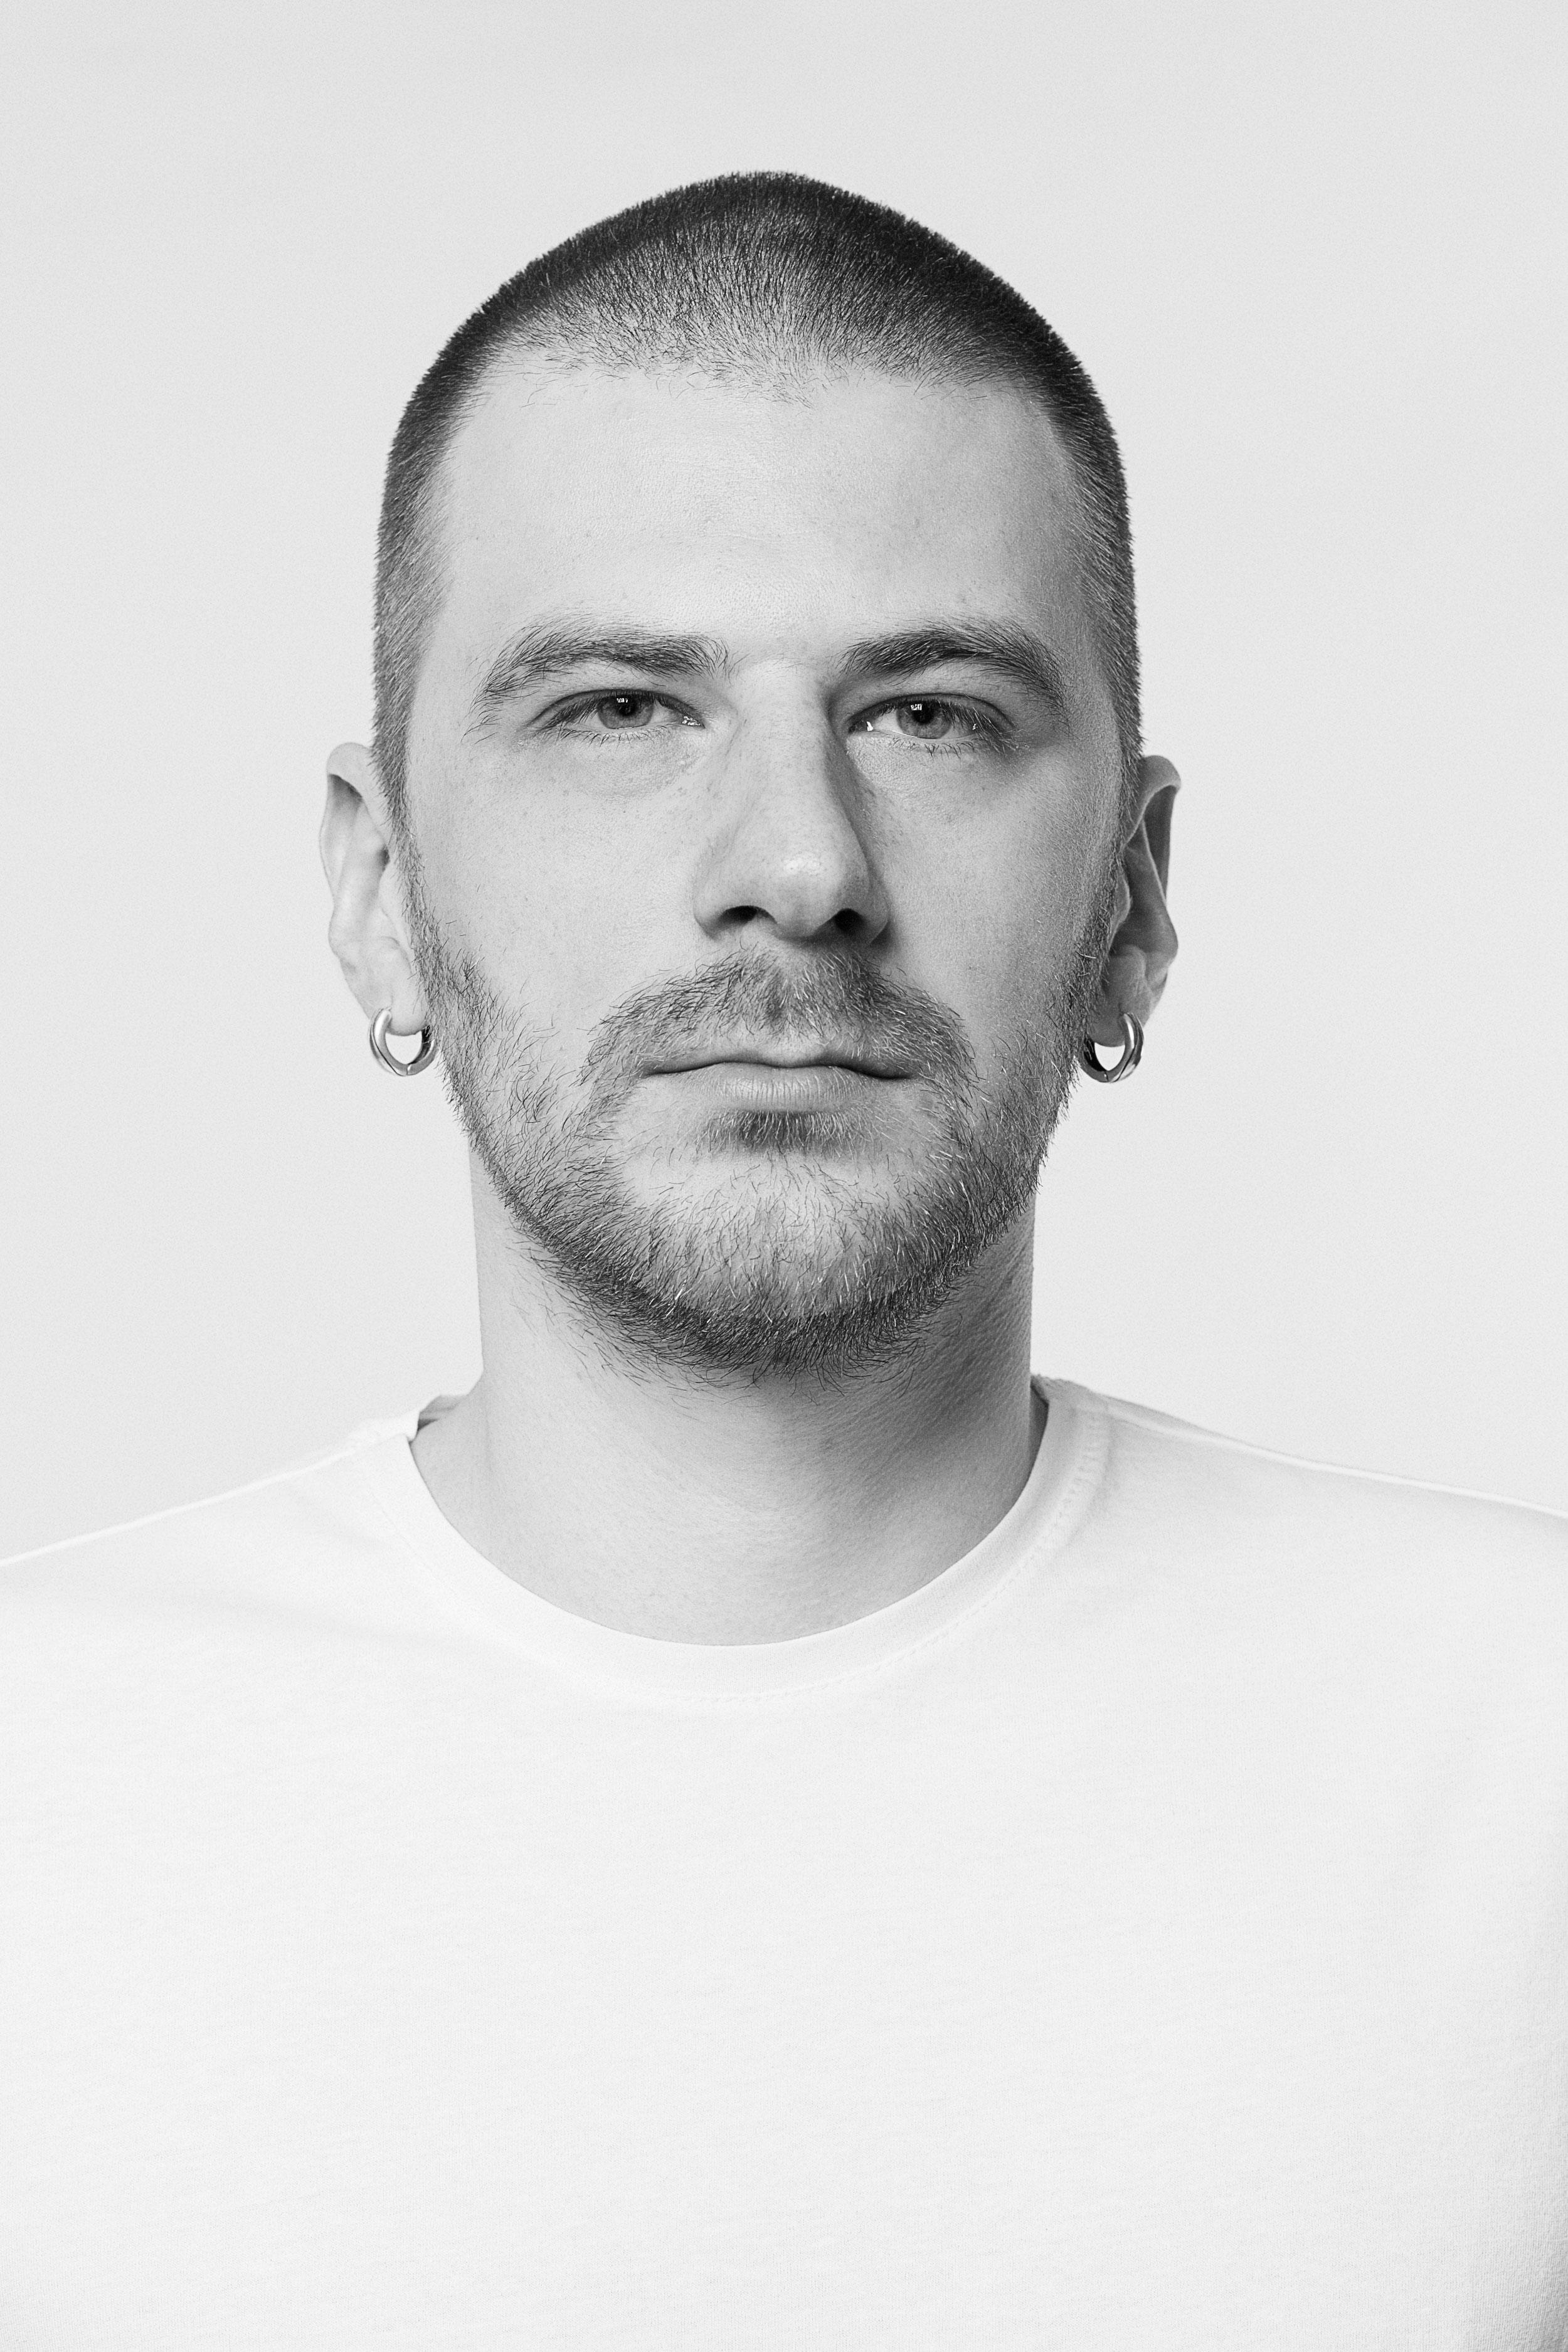 Tadas Maksimovas. Born on 9 April, 1984.